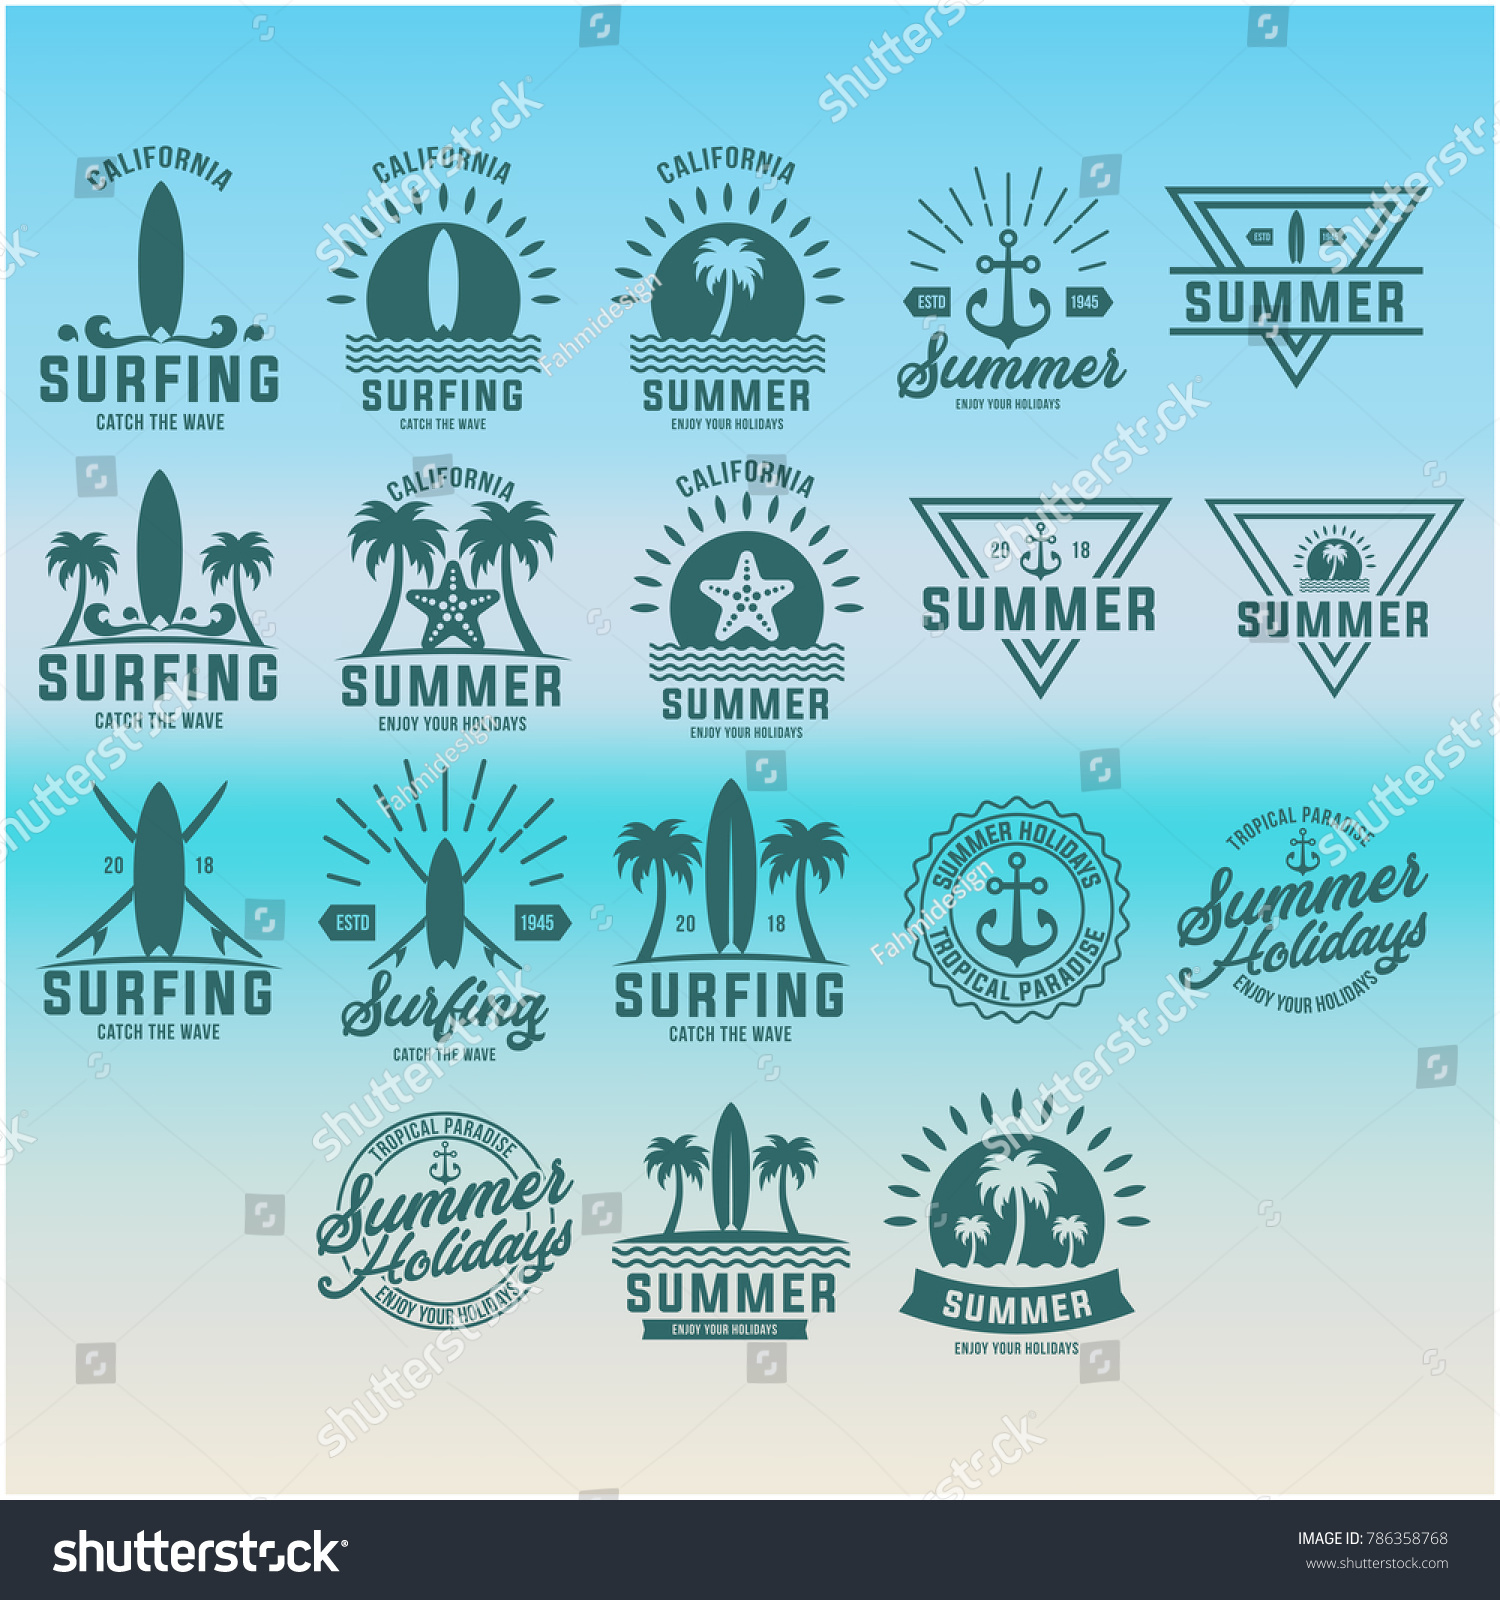 summer vacation beach sign design templates stock vector 786358768 shutterstock